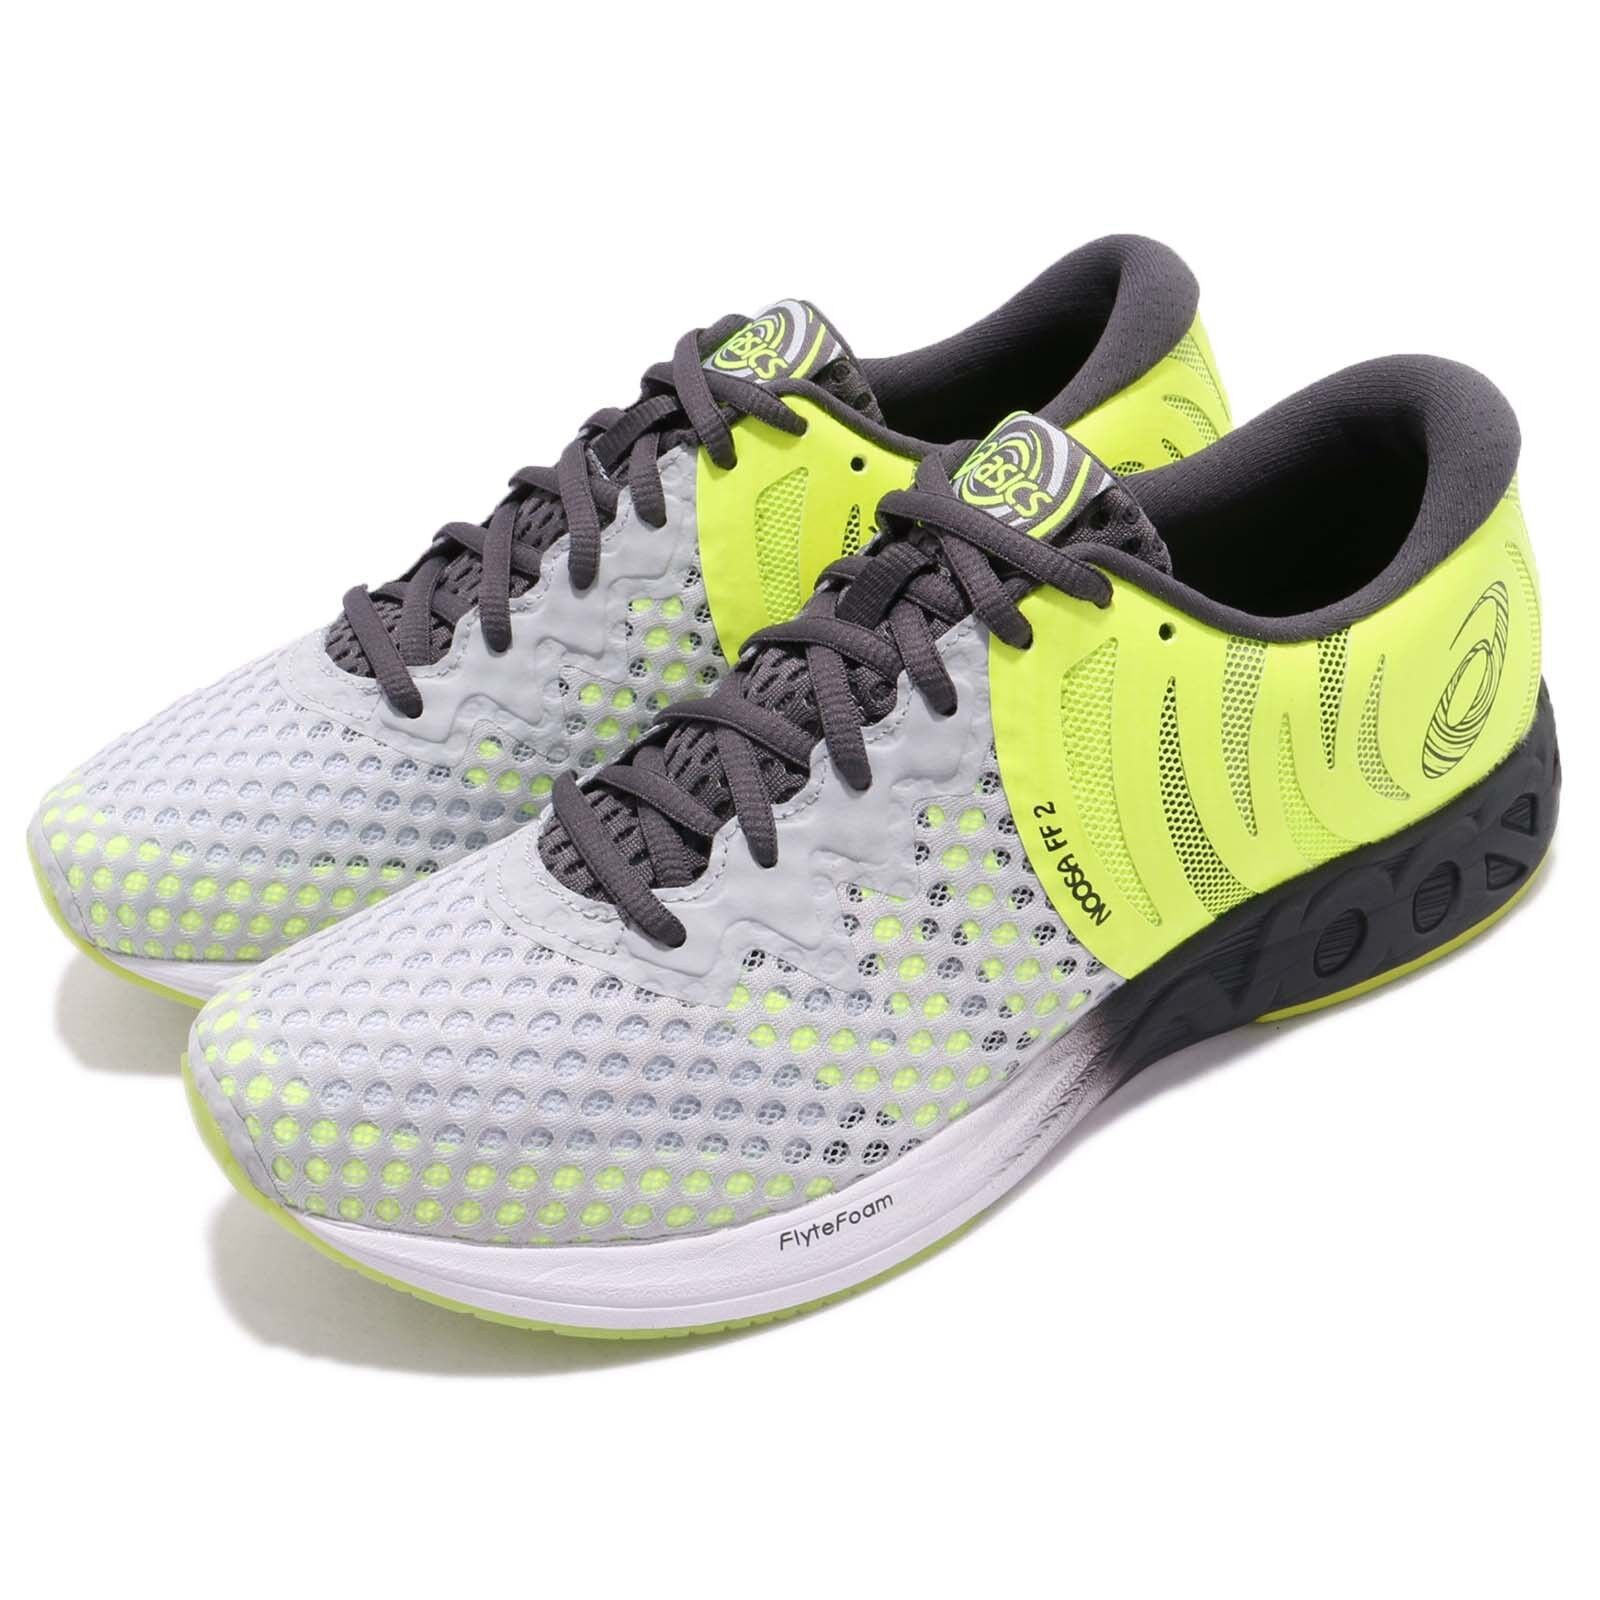 Asics Noosa FF 2 II Grey Yellow White Men Gear Fast Running shoes T819N-9695